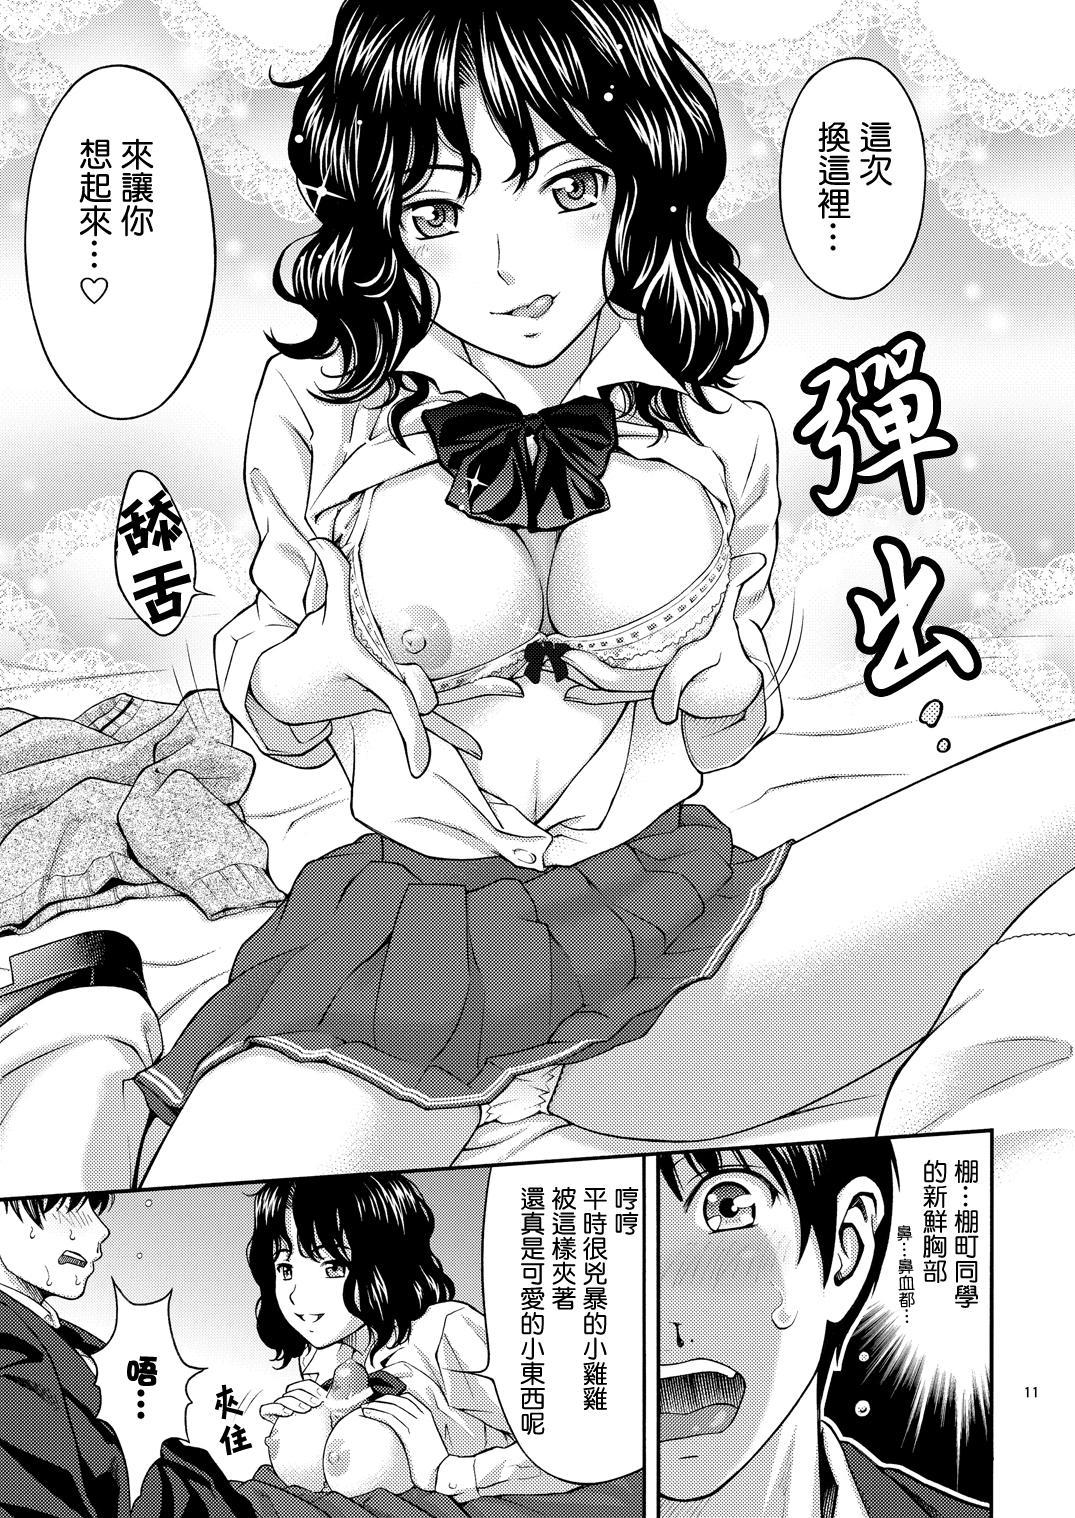 Tanamachi Pheromone 9